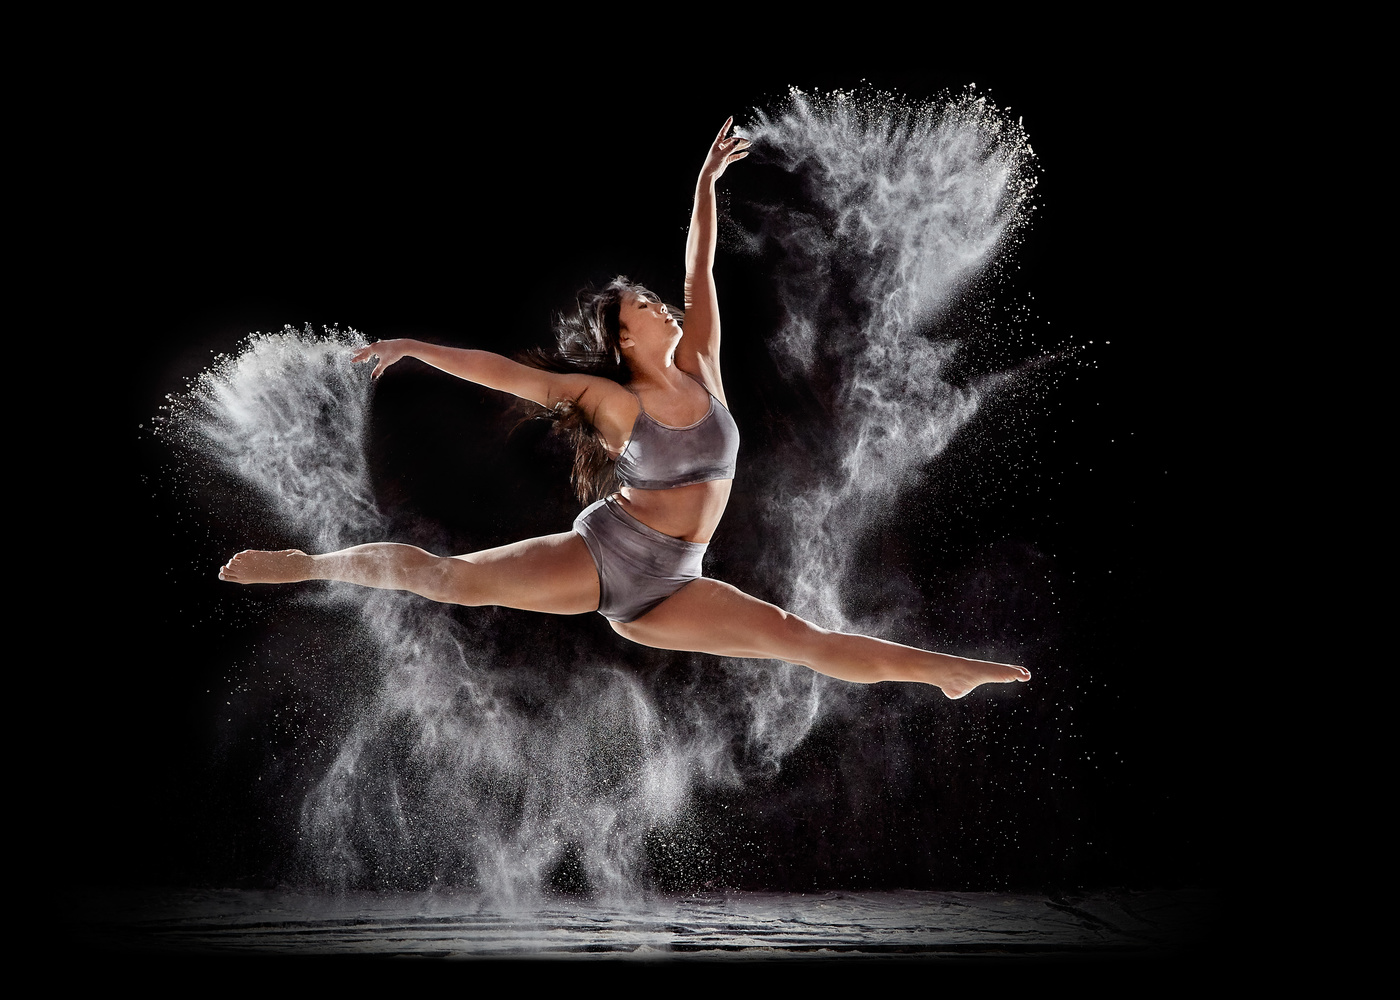 Split Jump by Hank Rintjema